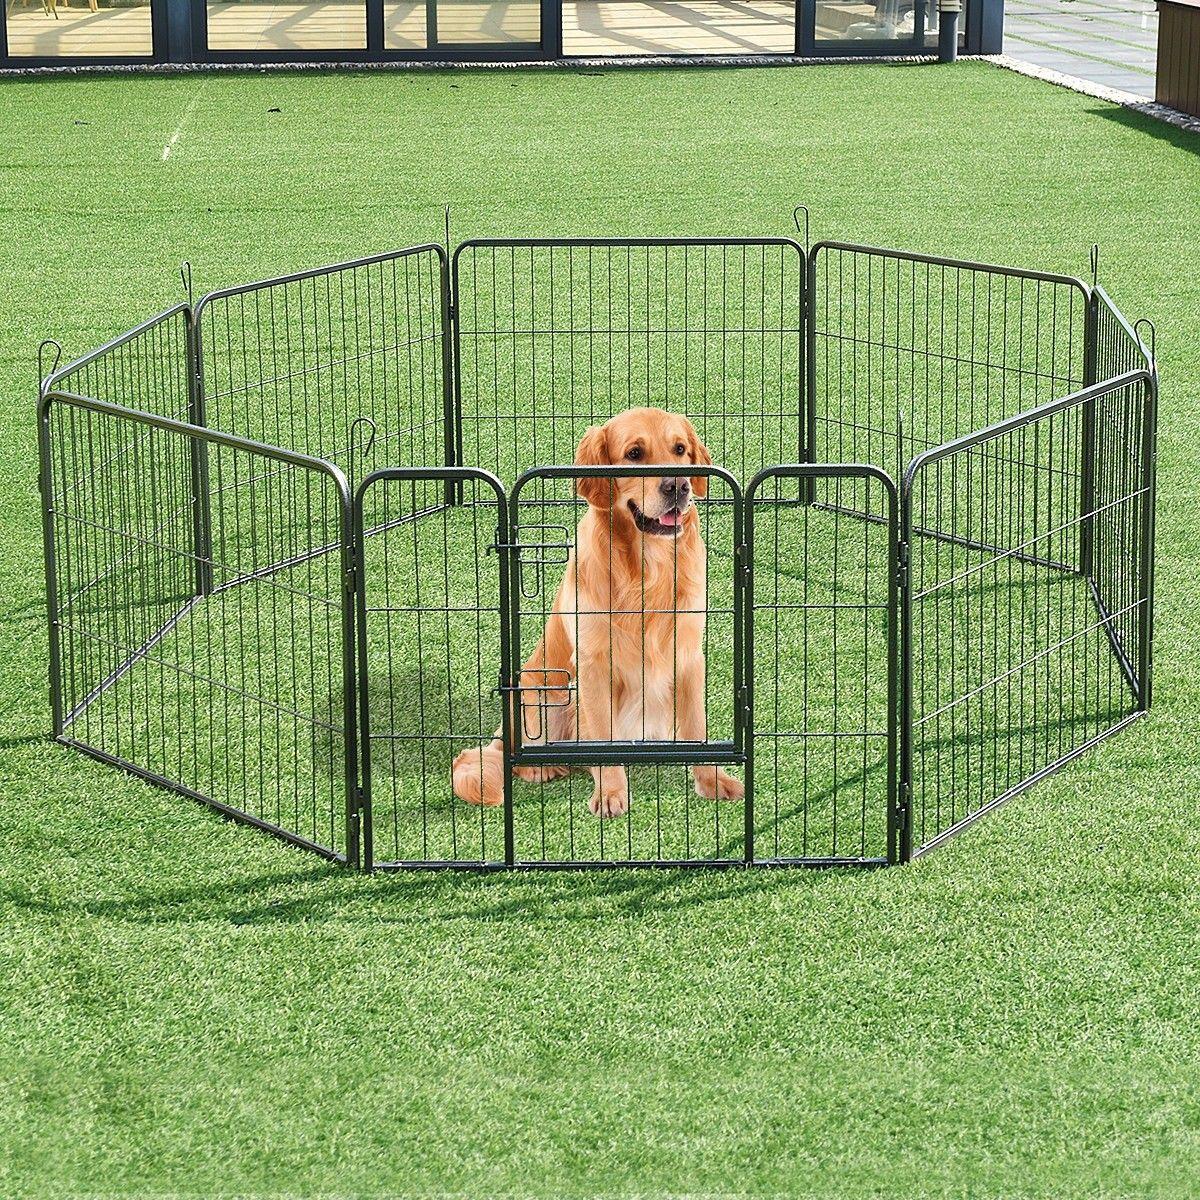 8 metal panel heavy duty pet dog safety gate playpen dog